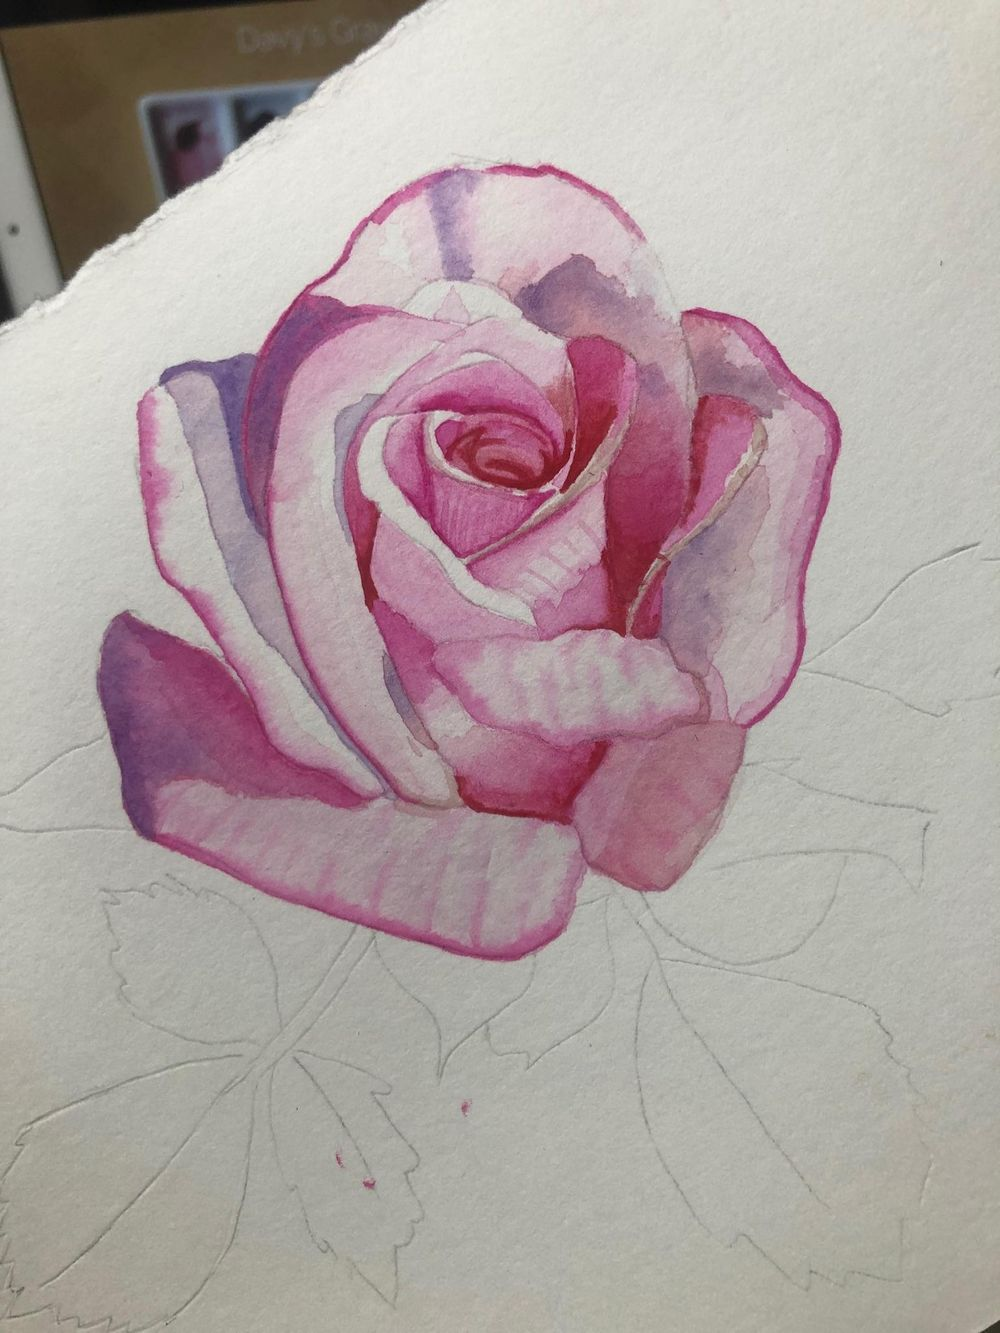 Opera rose - image 2 - student project